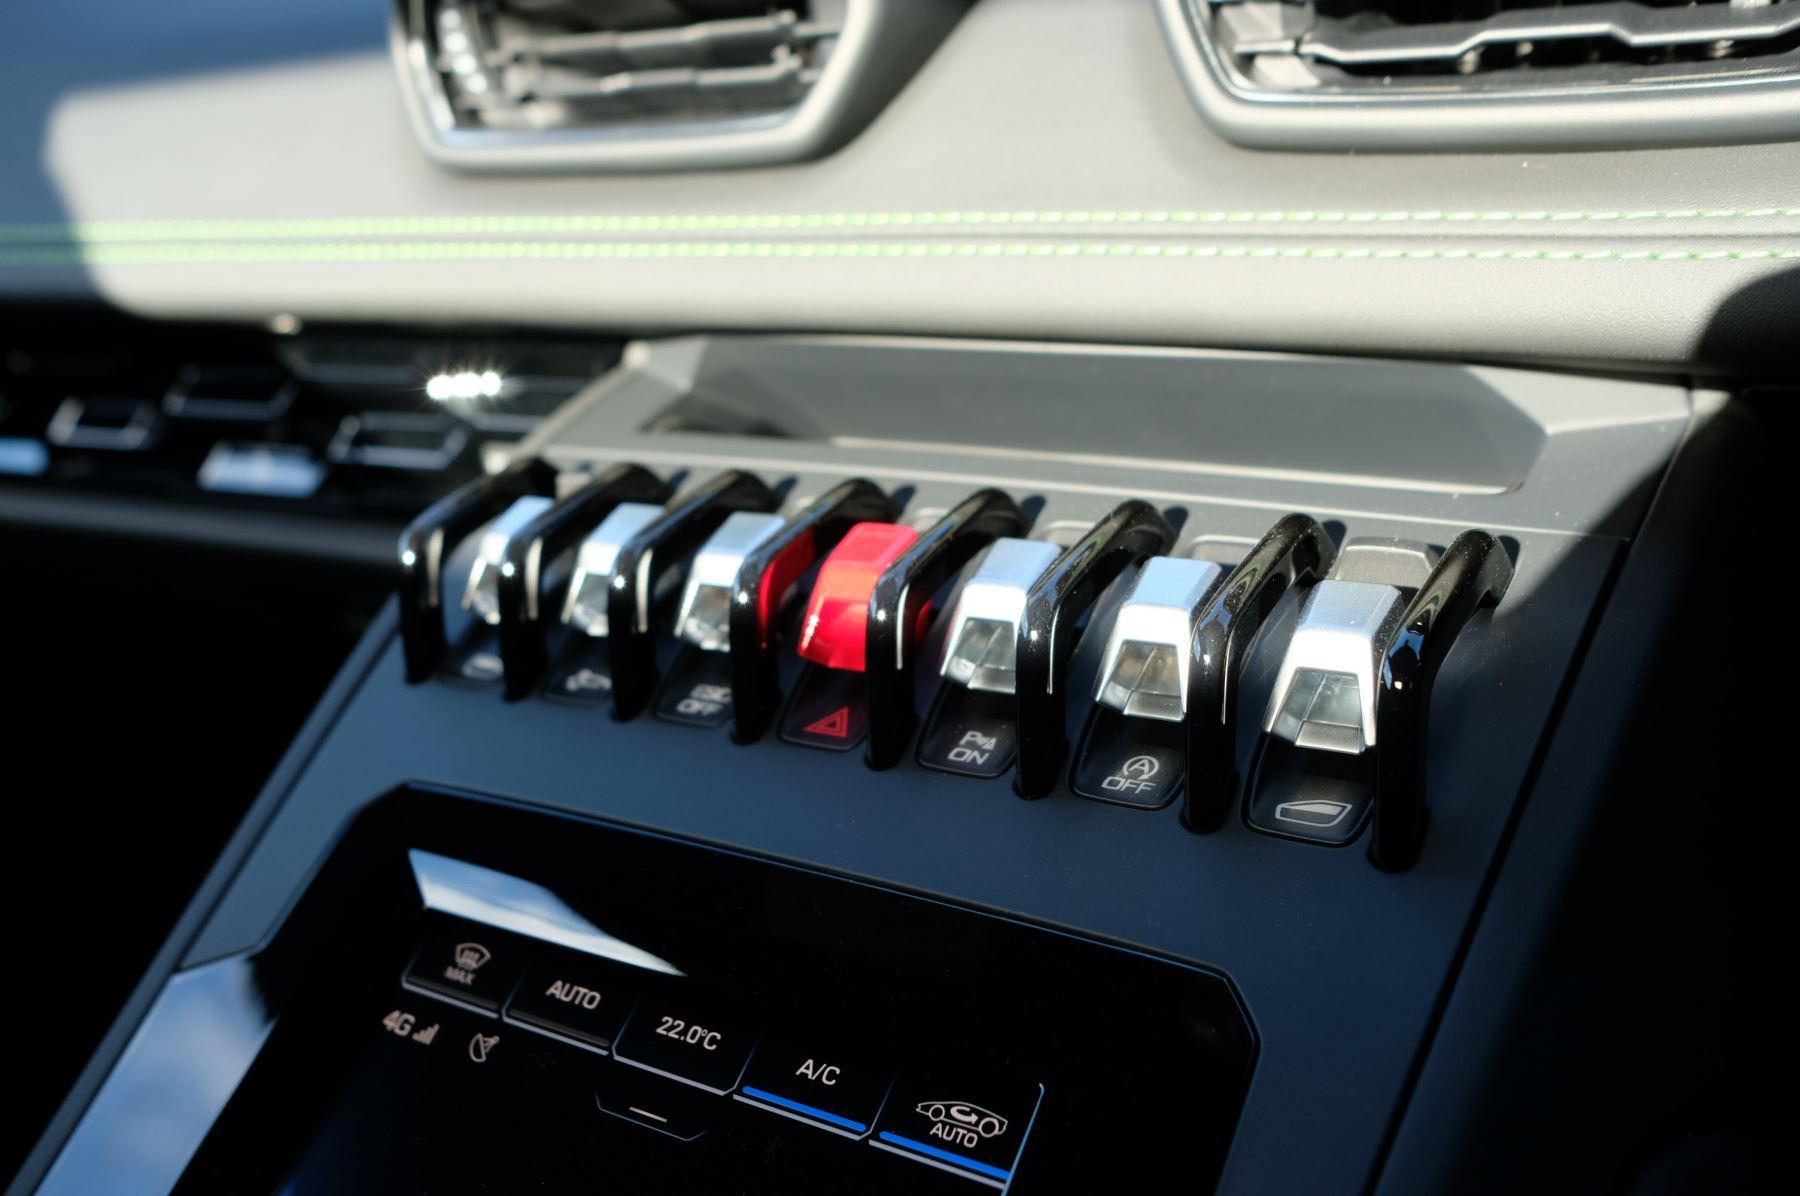 Lamborghini Huracan EVO Spyder 5.2 V10 610 2dr Auto image 16